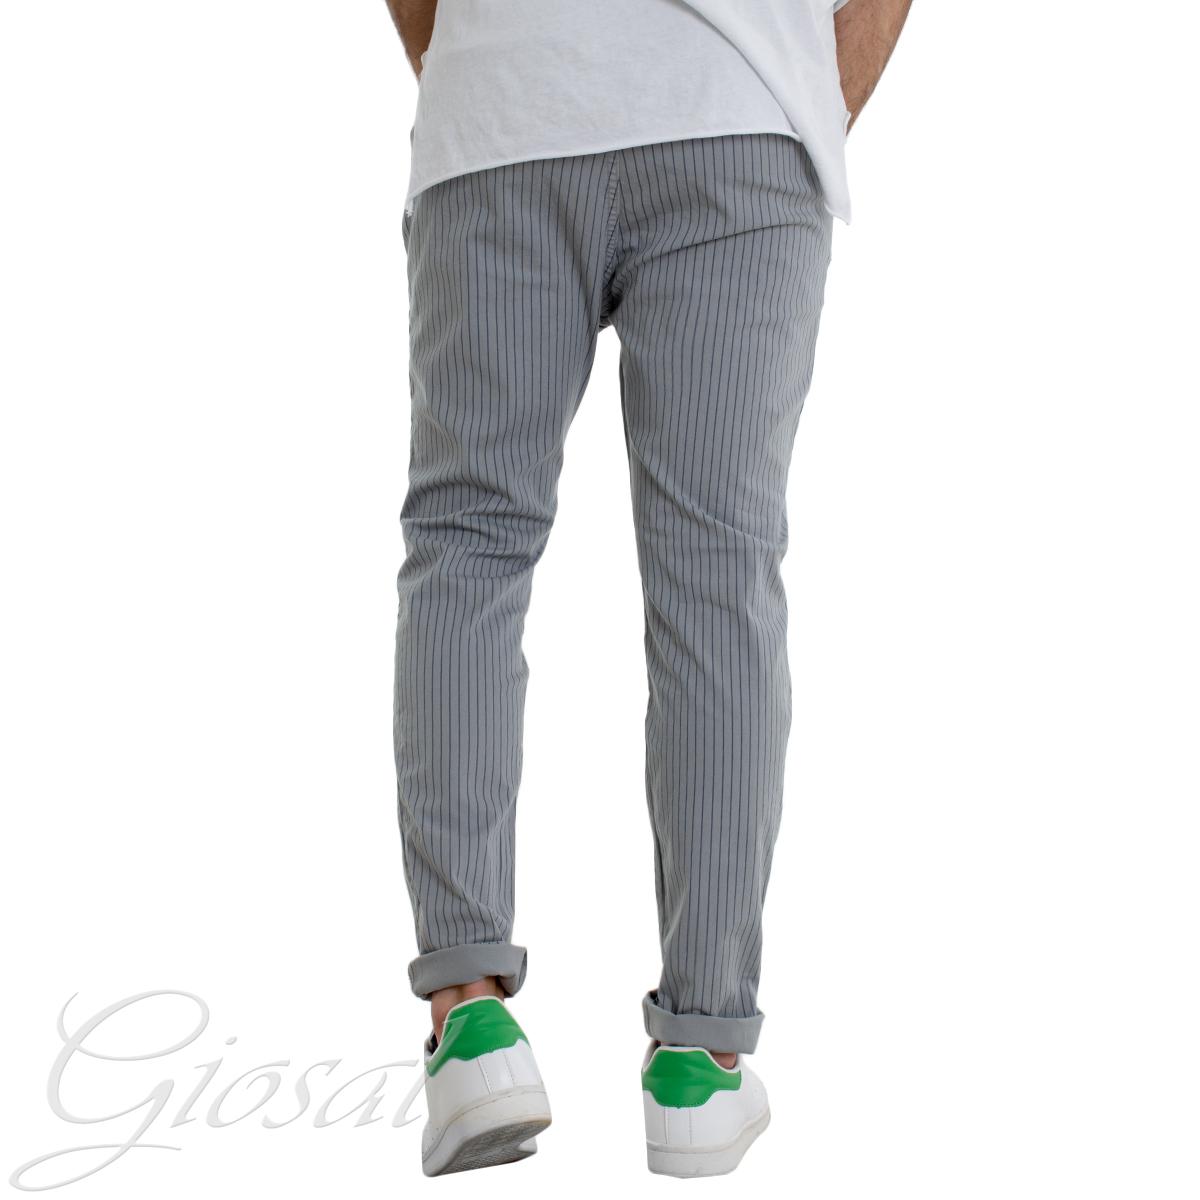 Pantalone-Uomo-Righe-Tinta-Unita-Vari-Colori-Tasca-America-Casual-GIOSAL